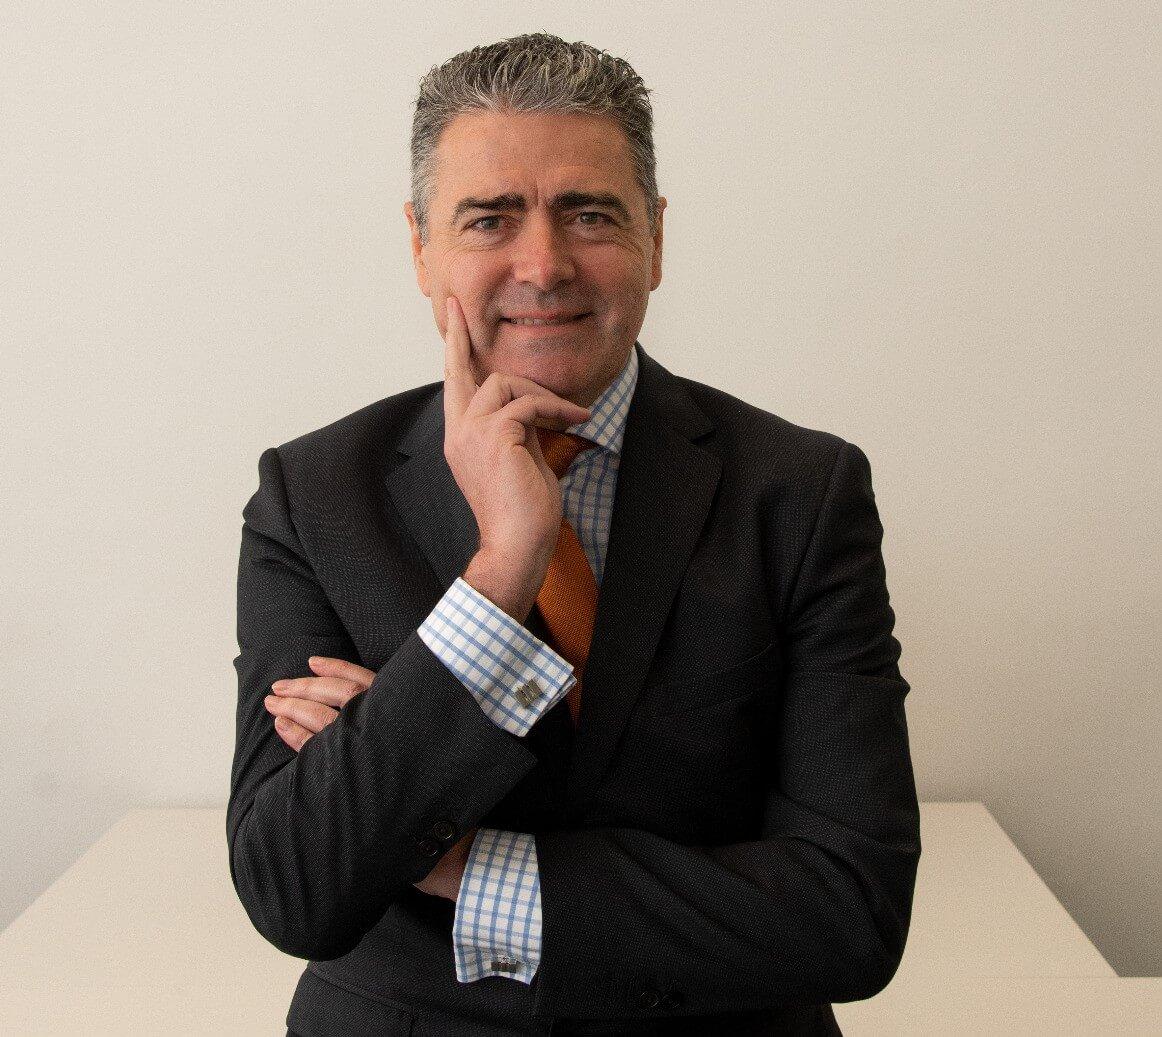 Rogelio Villalba Gárcia